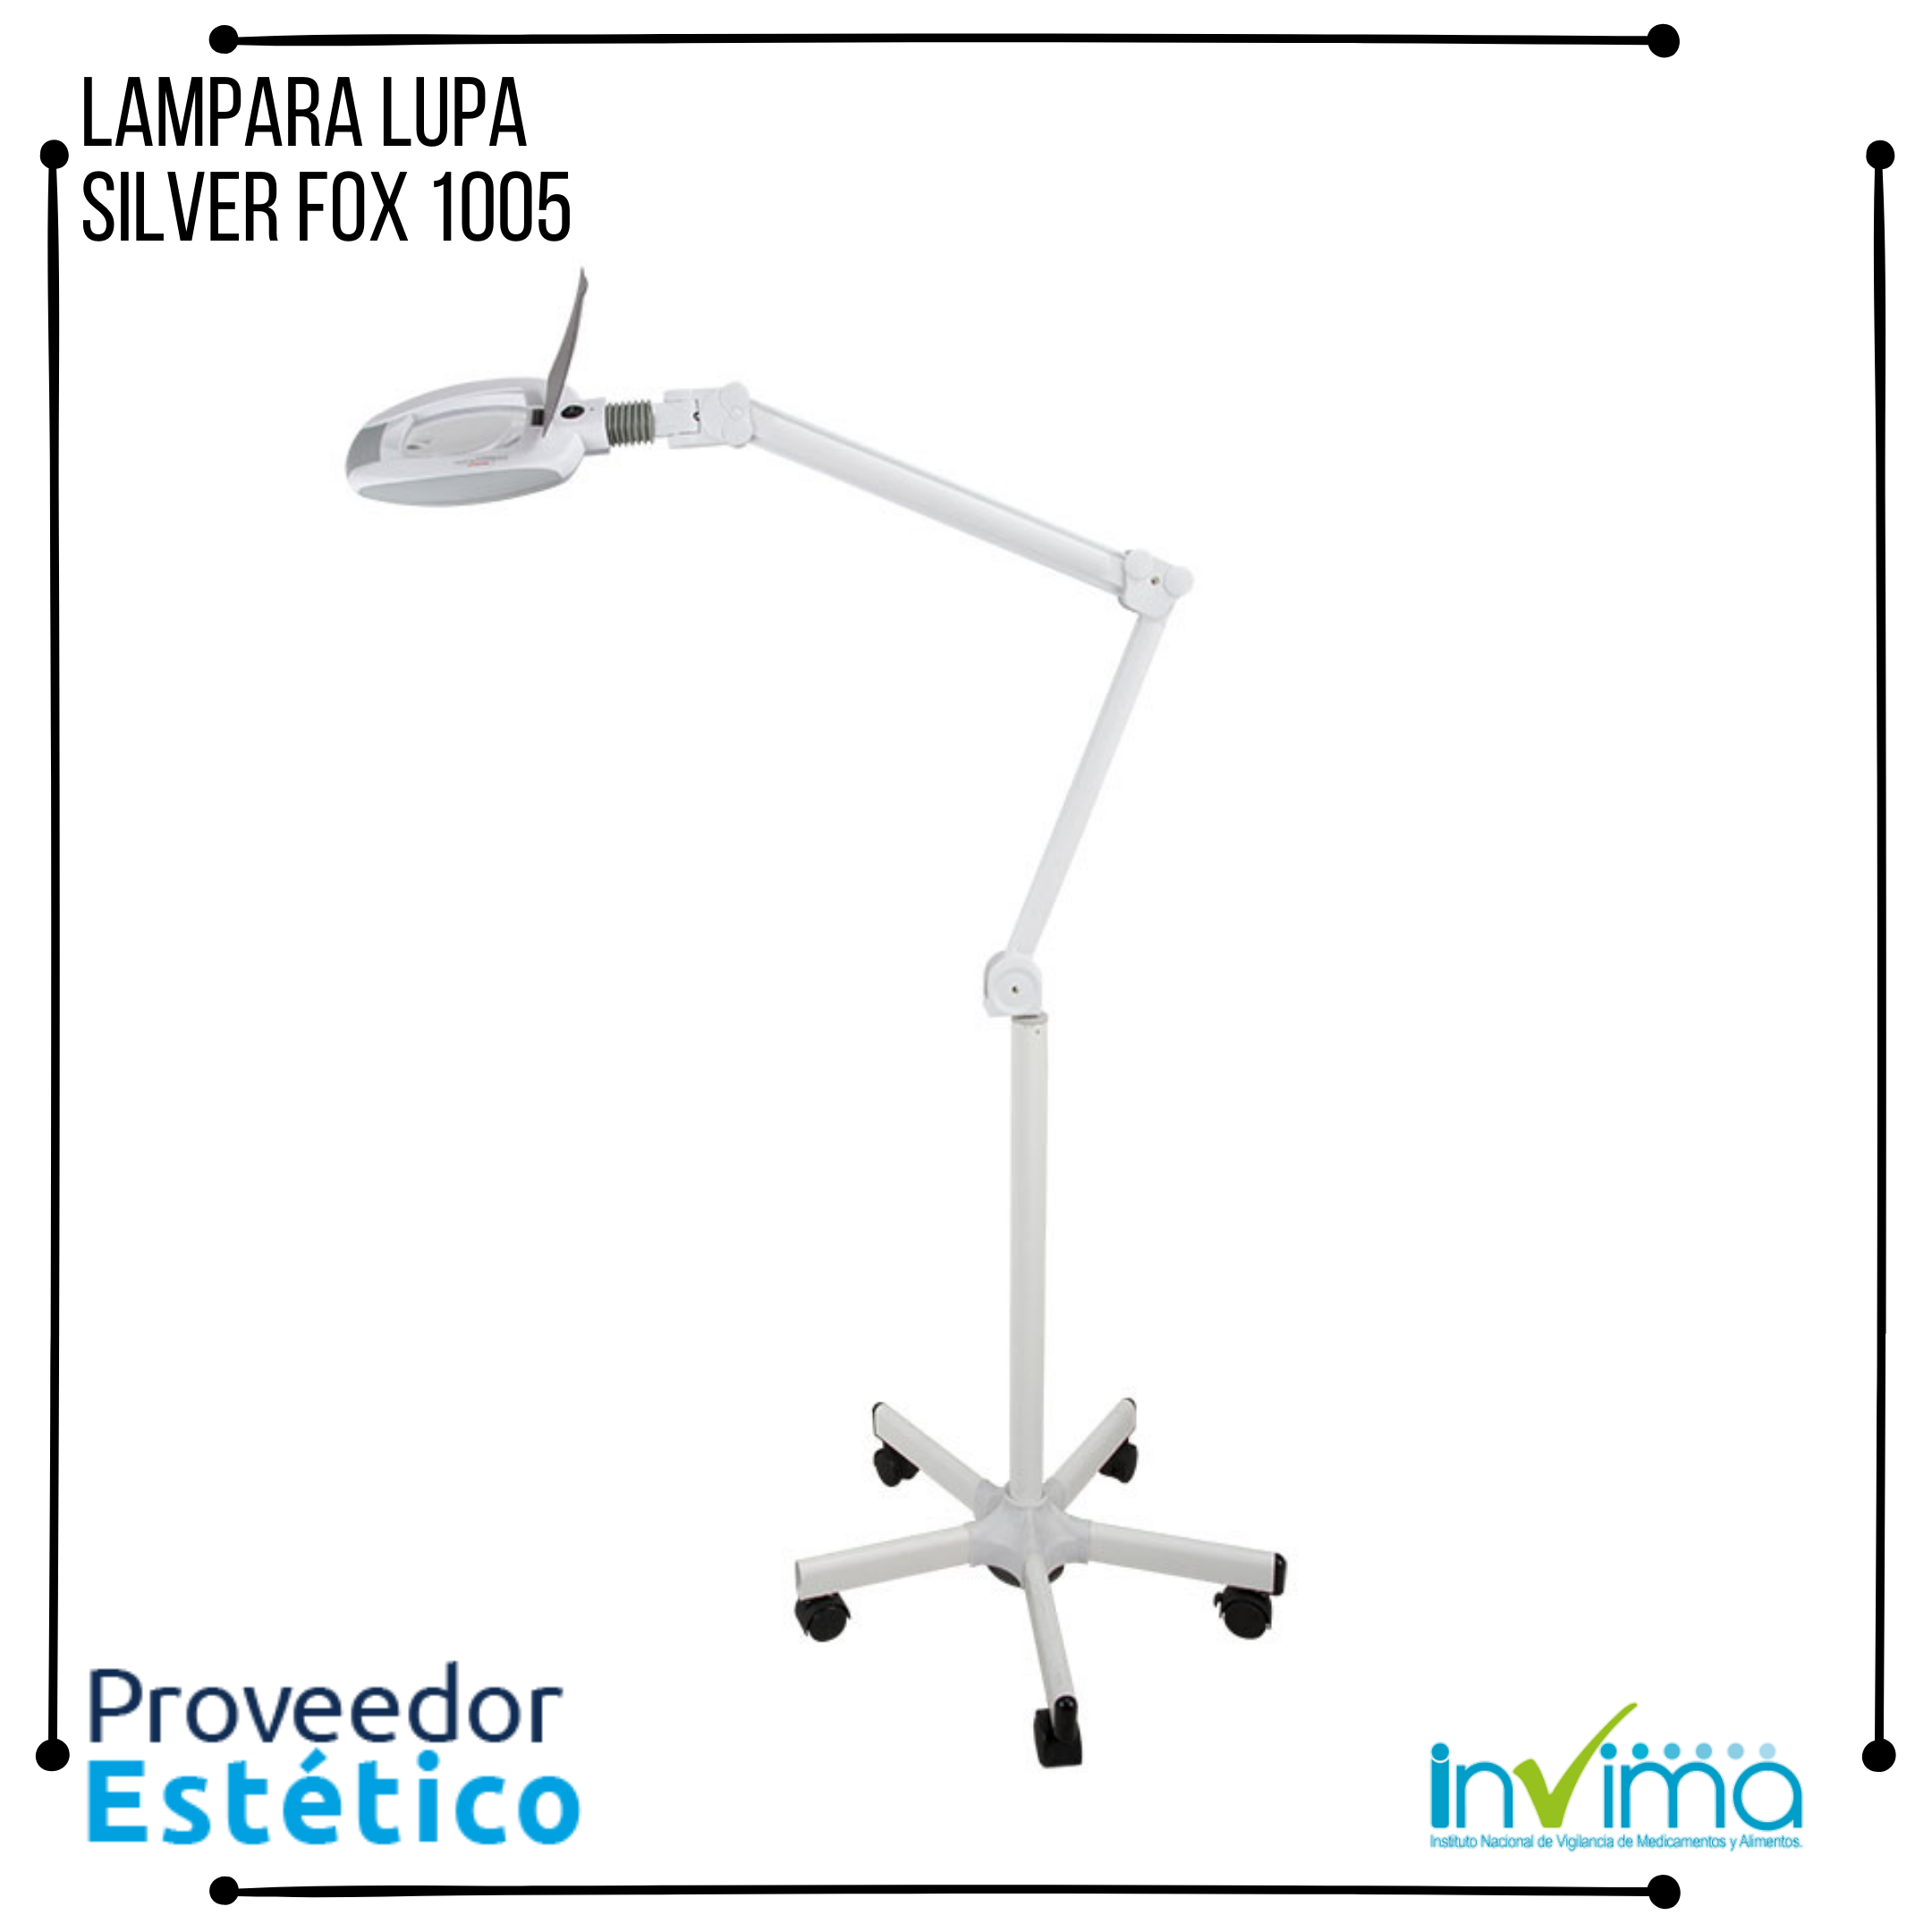 https://0201.nccdn.net/1_2/000/000/093/adb/lampara-lupa-silver-fox-1005--3-.png